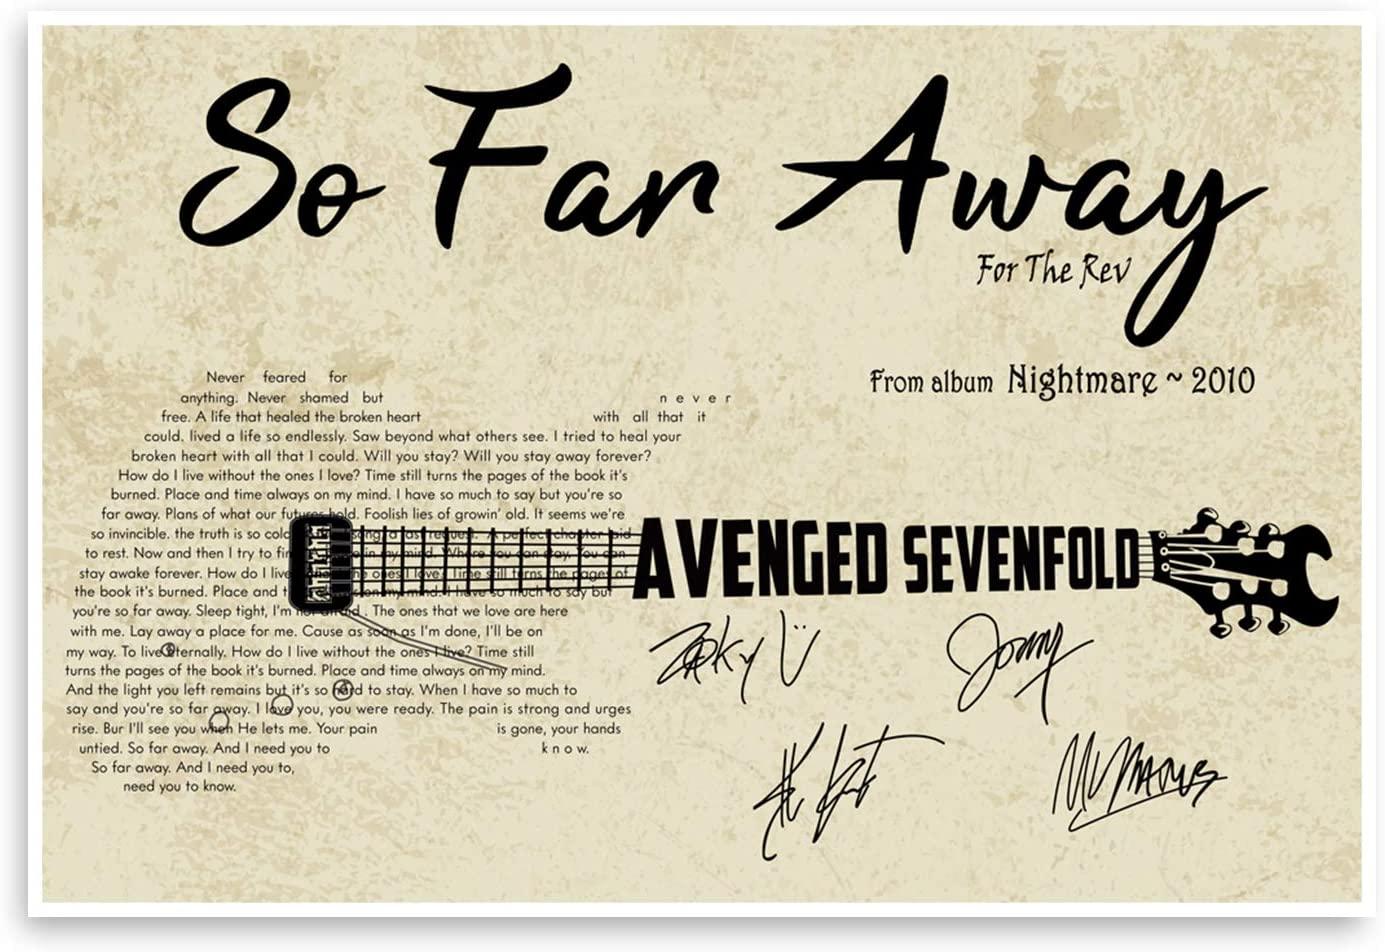 DesDirect2 Store So Far Away Avenged Sevenfold Lyric Print Poster White - Satin Portrait Poster Wall Art Home